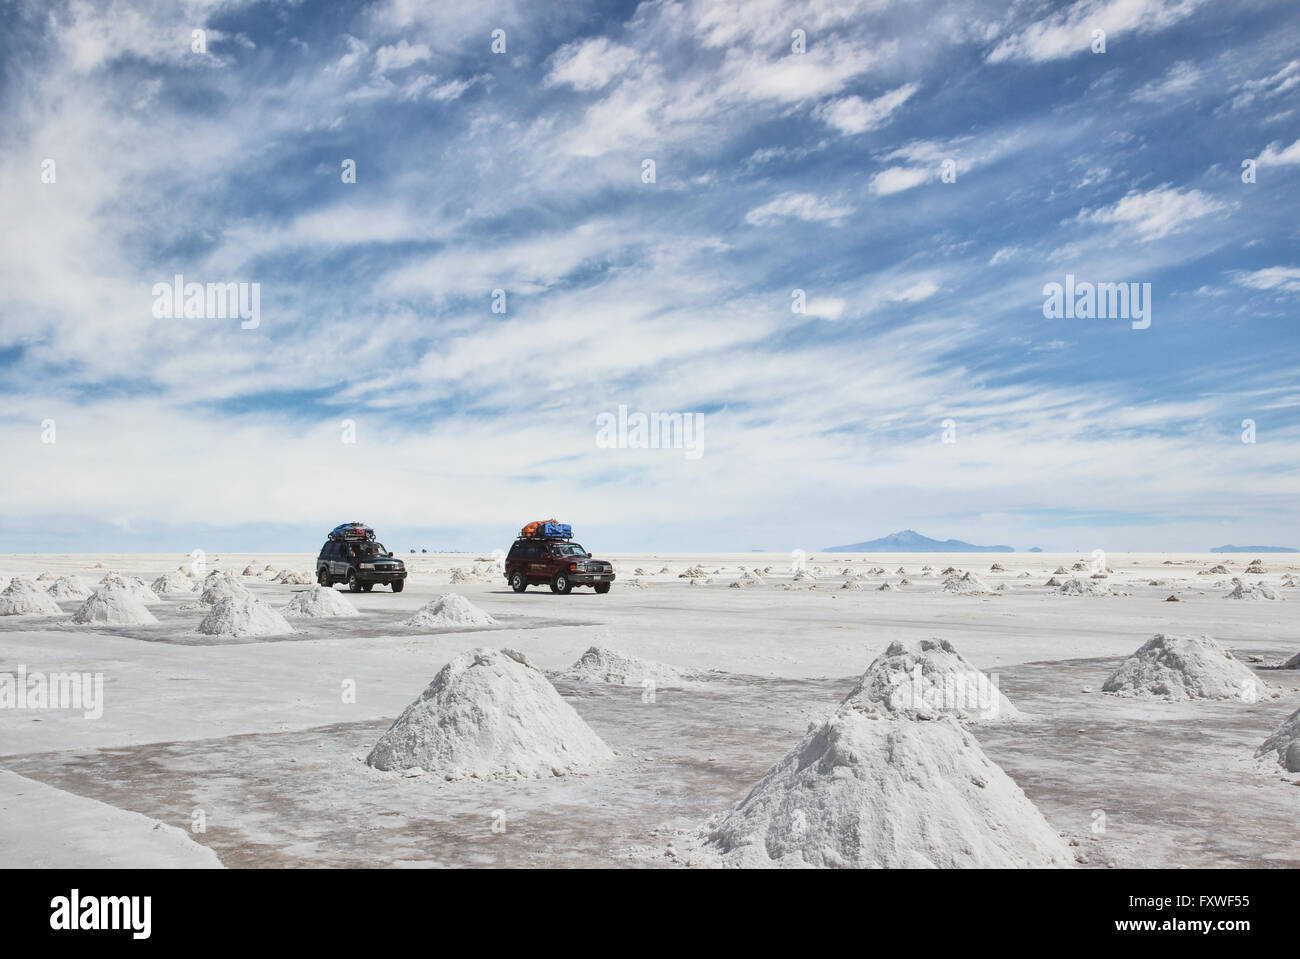 Bolivie - 22/08/2013 - Bolivie / Salar de Uyuni / Uyuni - désert de sel, Uyuni - Sandrine Huet / Le Pictorium Photo Stock